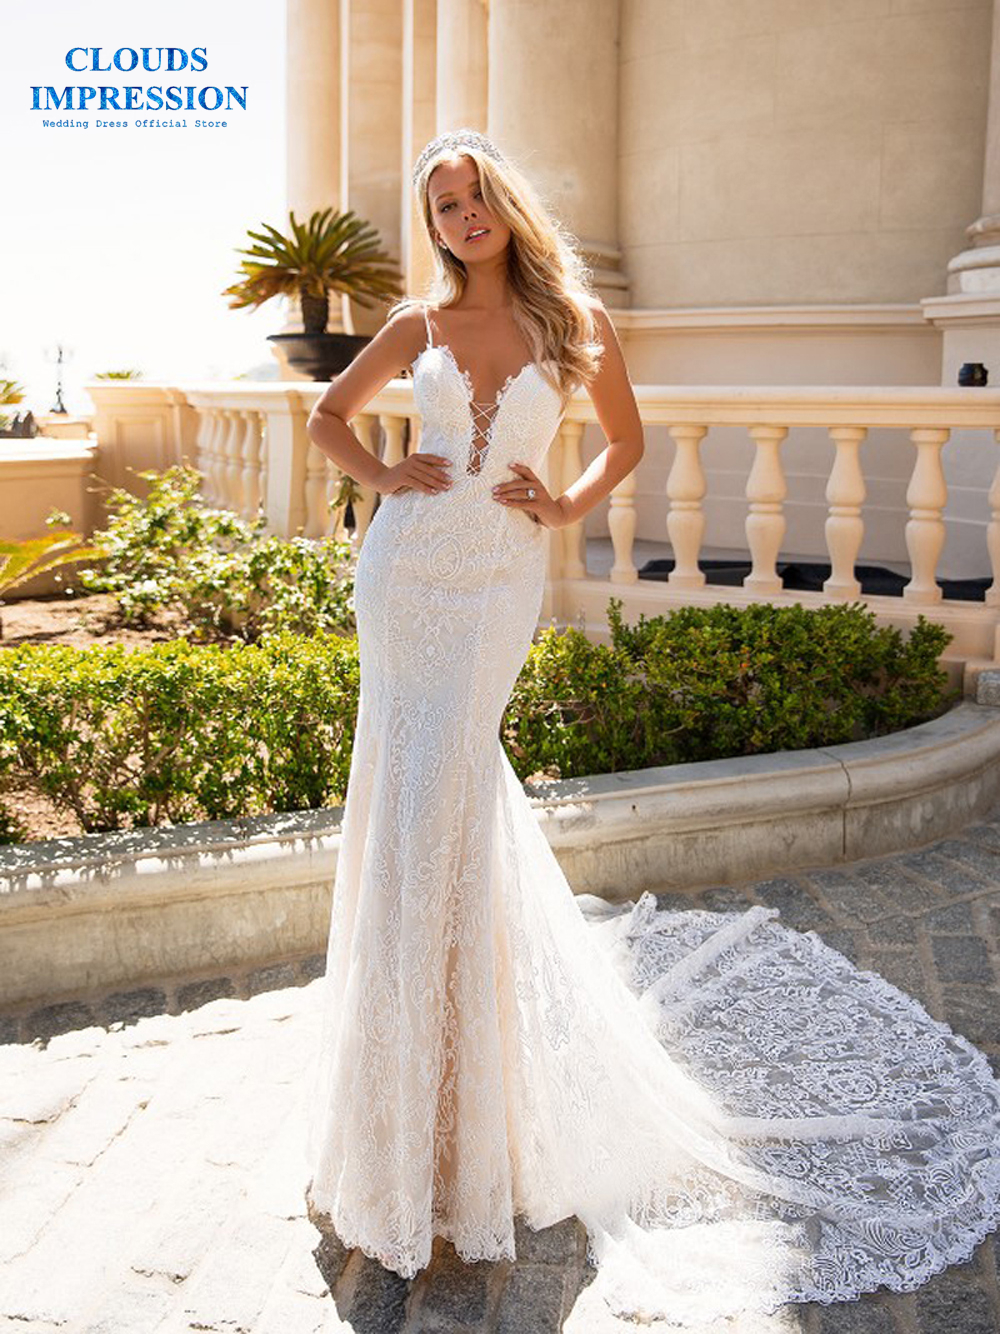 CLOUDS IMPRESSION Sexy Gorgeous Mermaid 2019 Wedding Dress Beading Deep V neck Lace Plus Size Vestige De Noiva Bride Dress-in Wedding Dresses from Weddings & Events    1